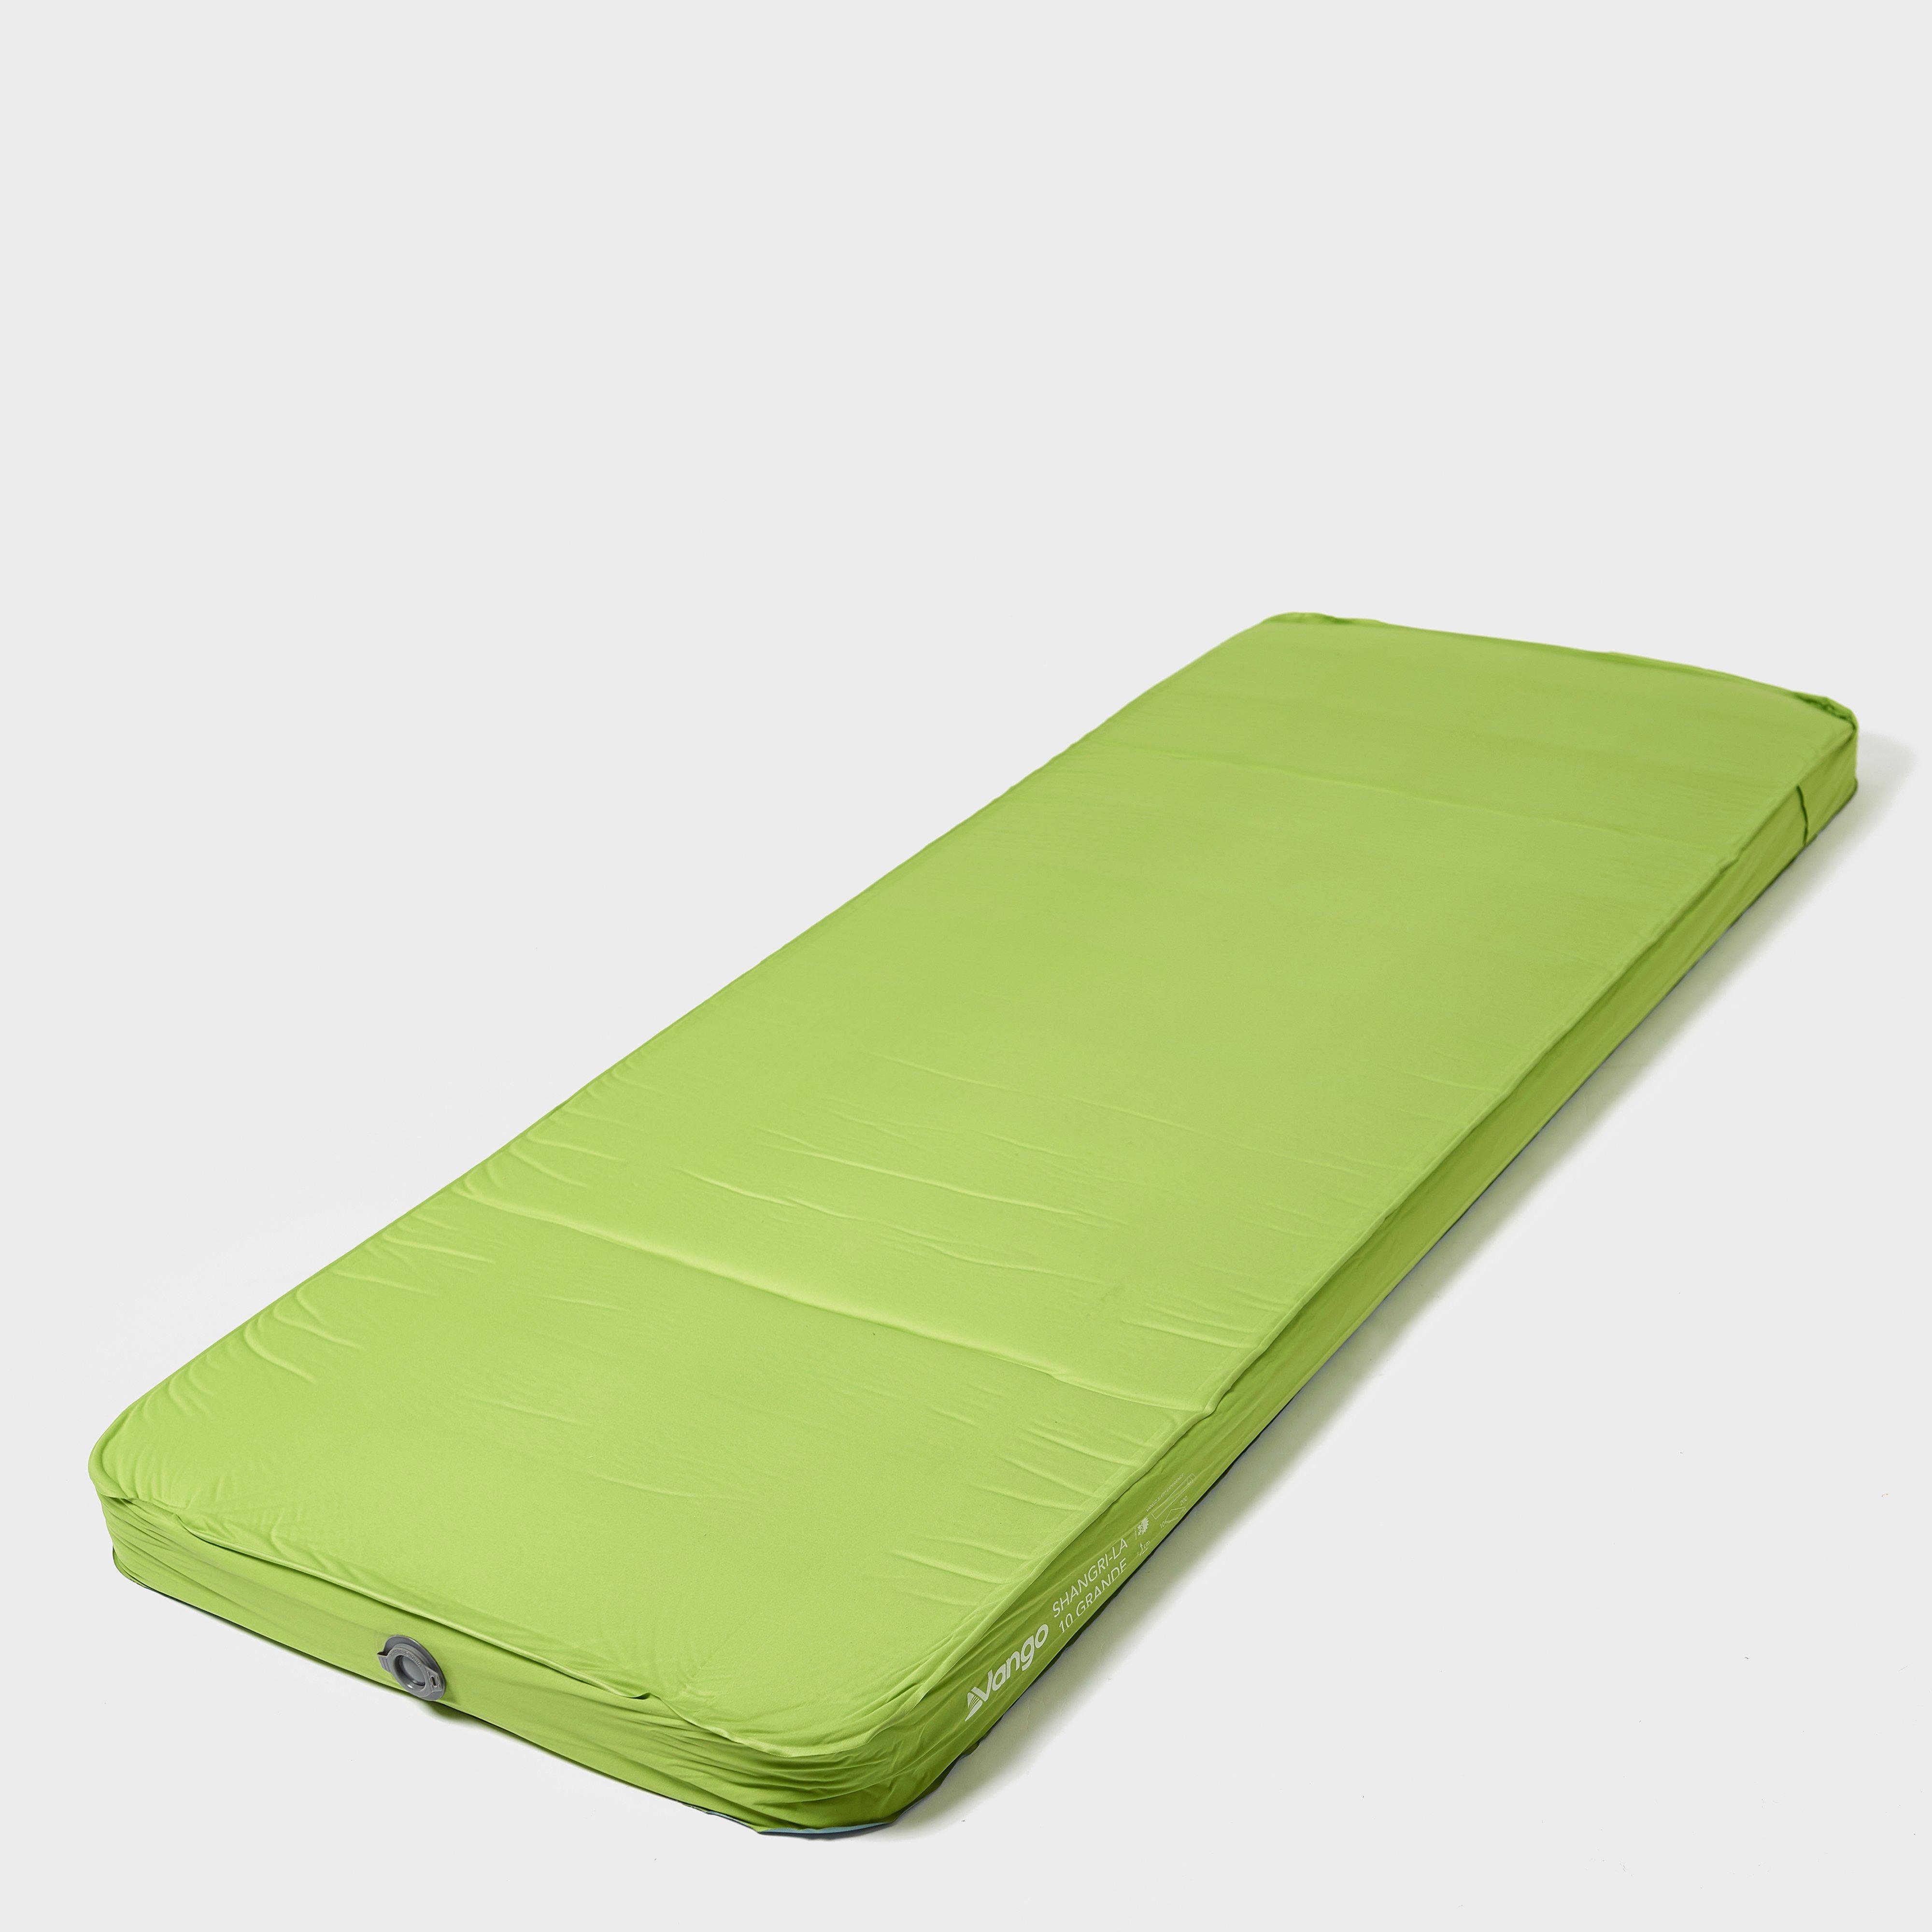 VANGO Shangri-La Sleeping Mat, Green/Green